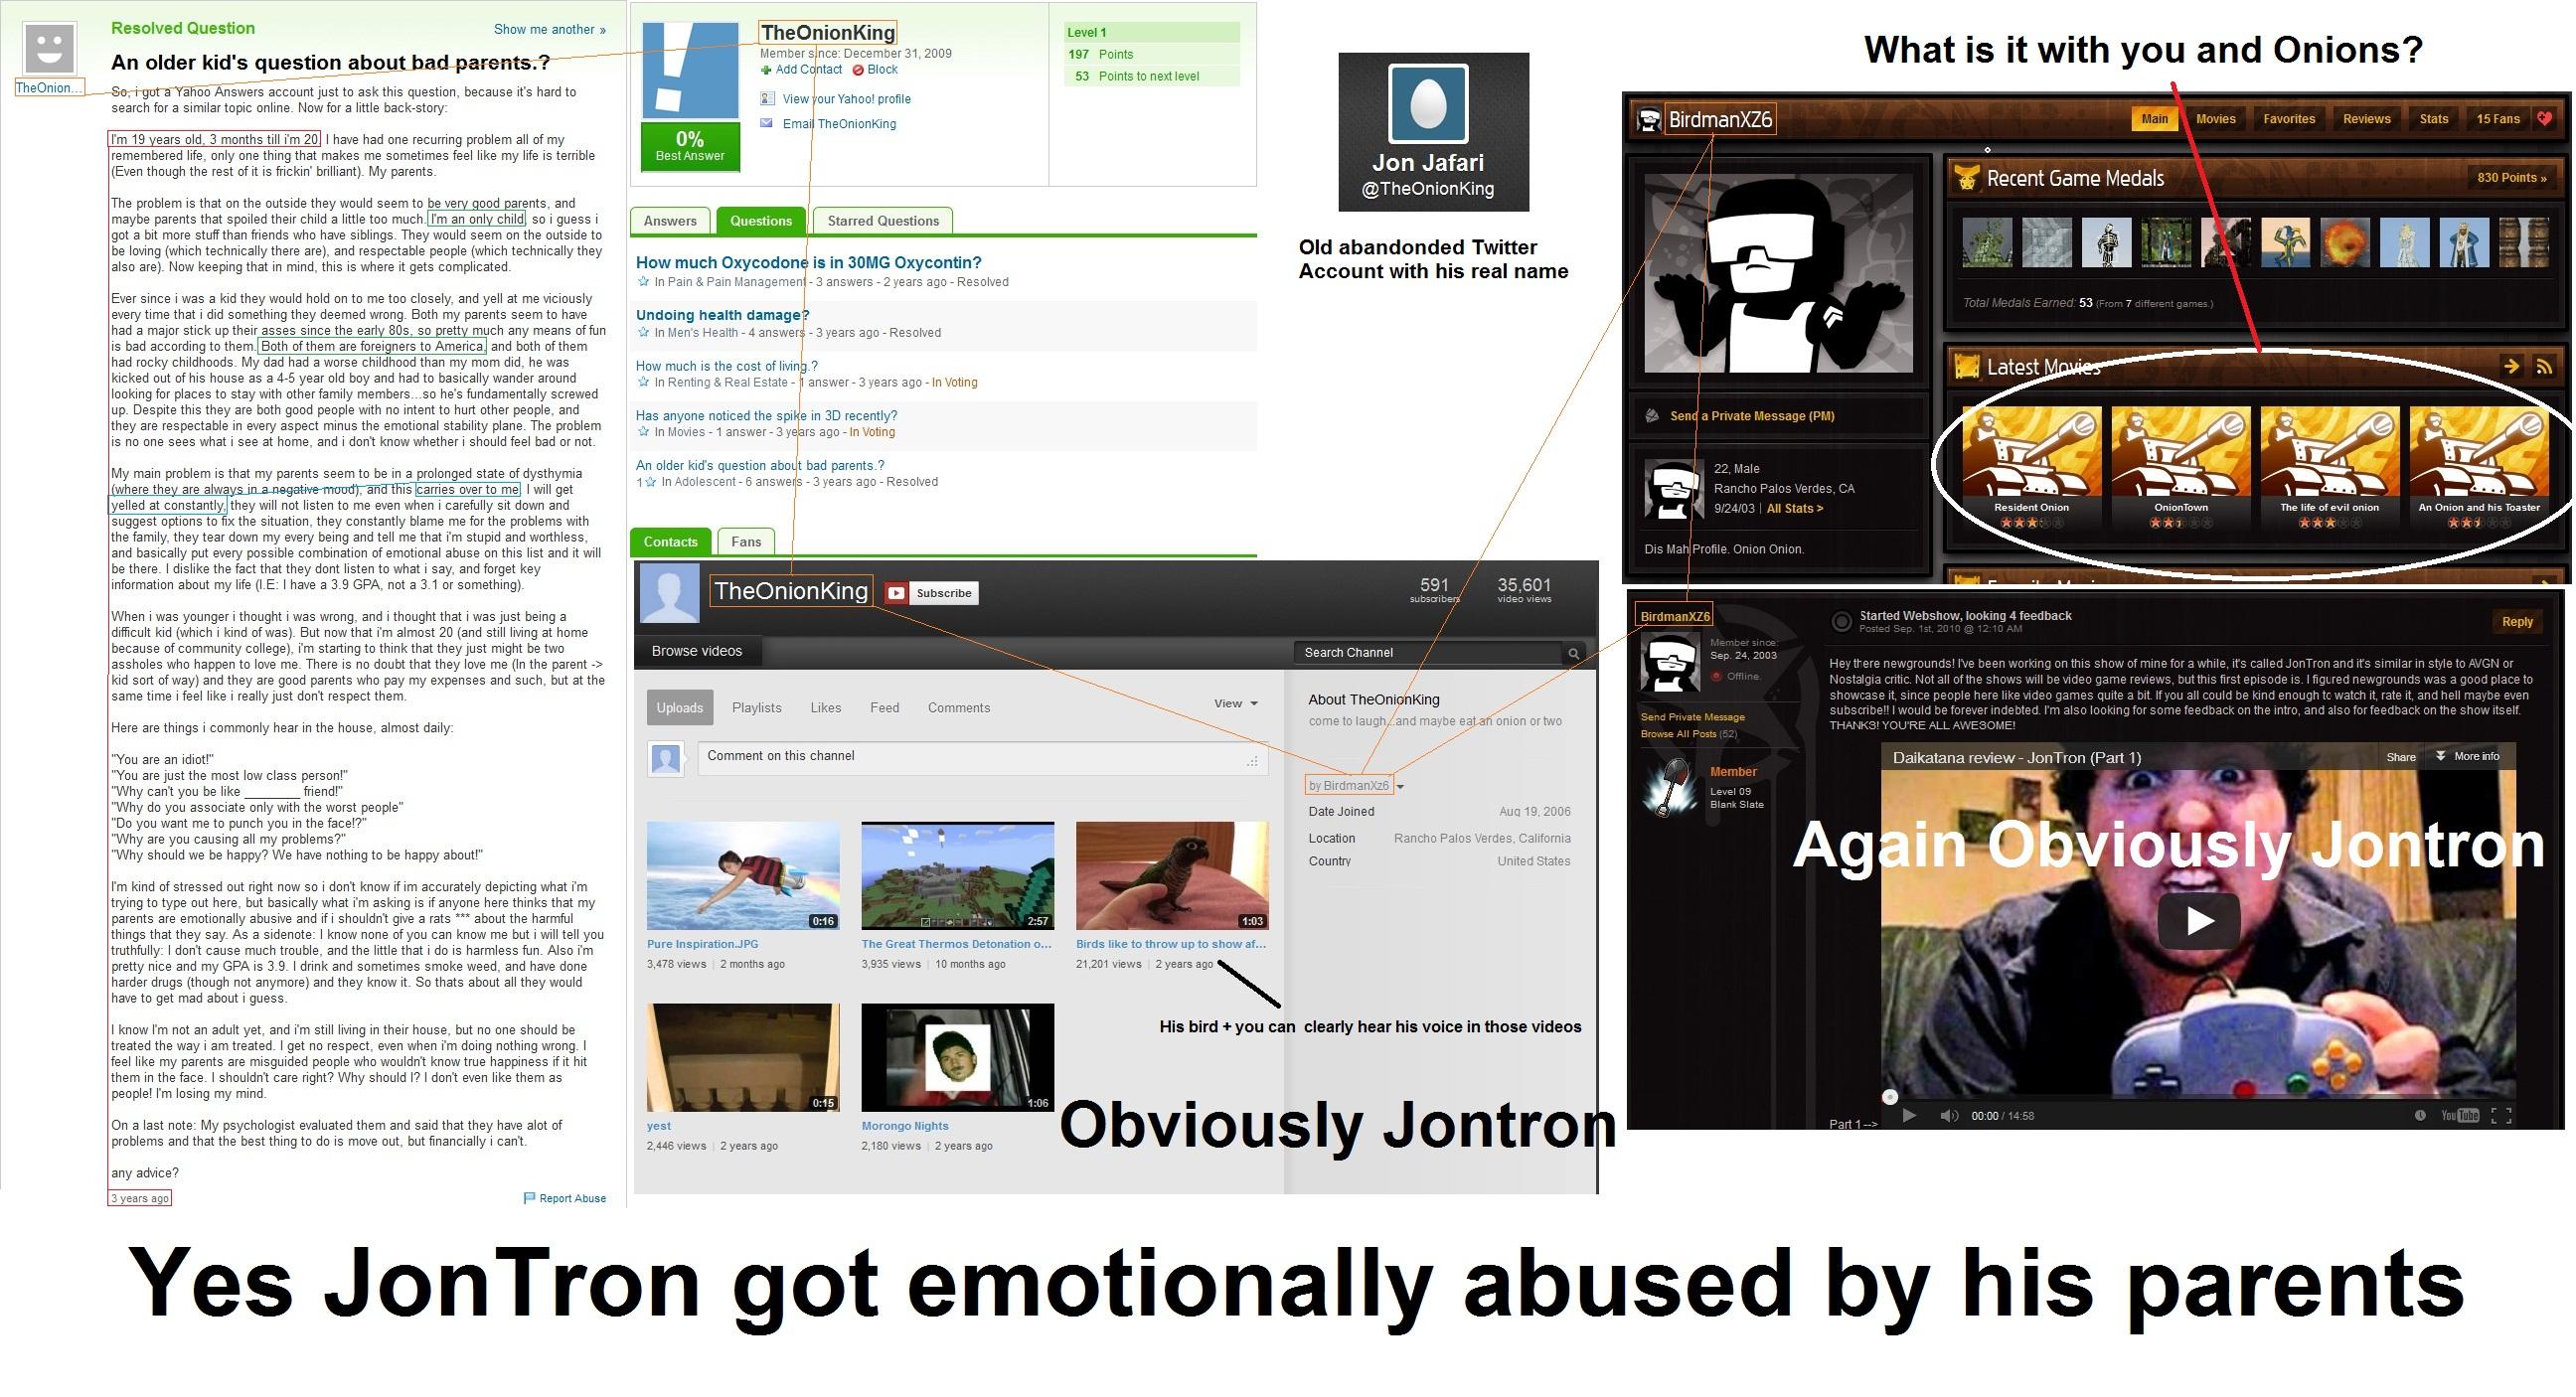 Jontrons Parents Were Emotionally Troubling Jontron Jon Jafari